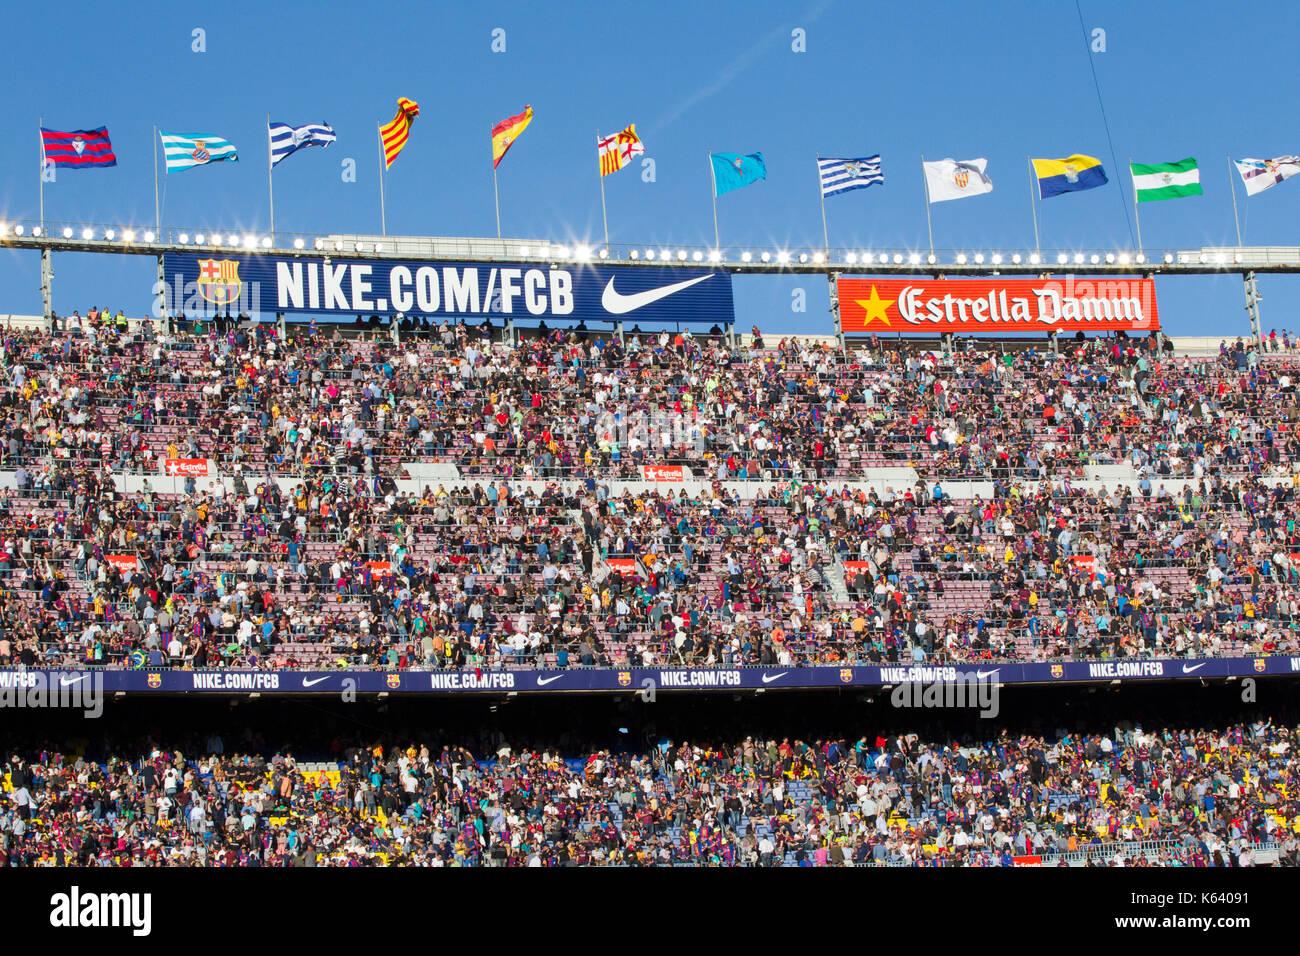 6/5/17 Barcelona v Villarreal football league match at the Camp Nou stadium, Barcelona. - Stock Image